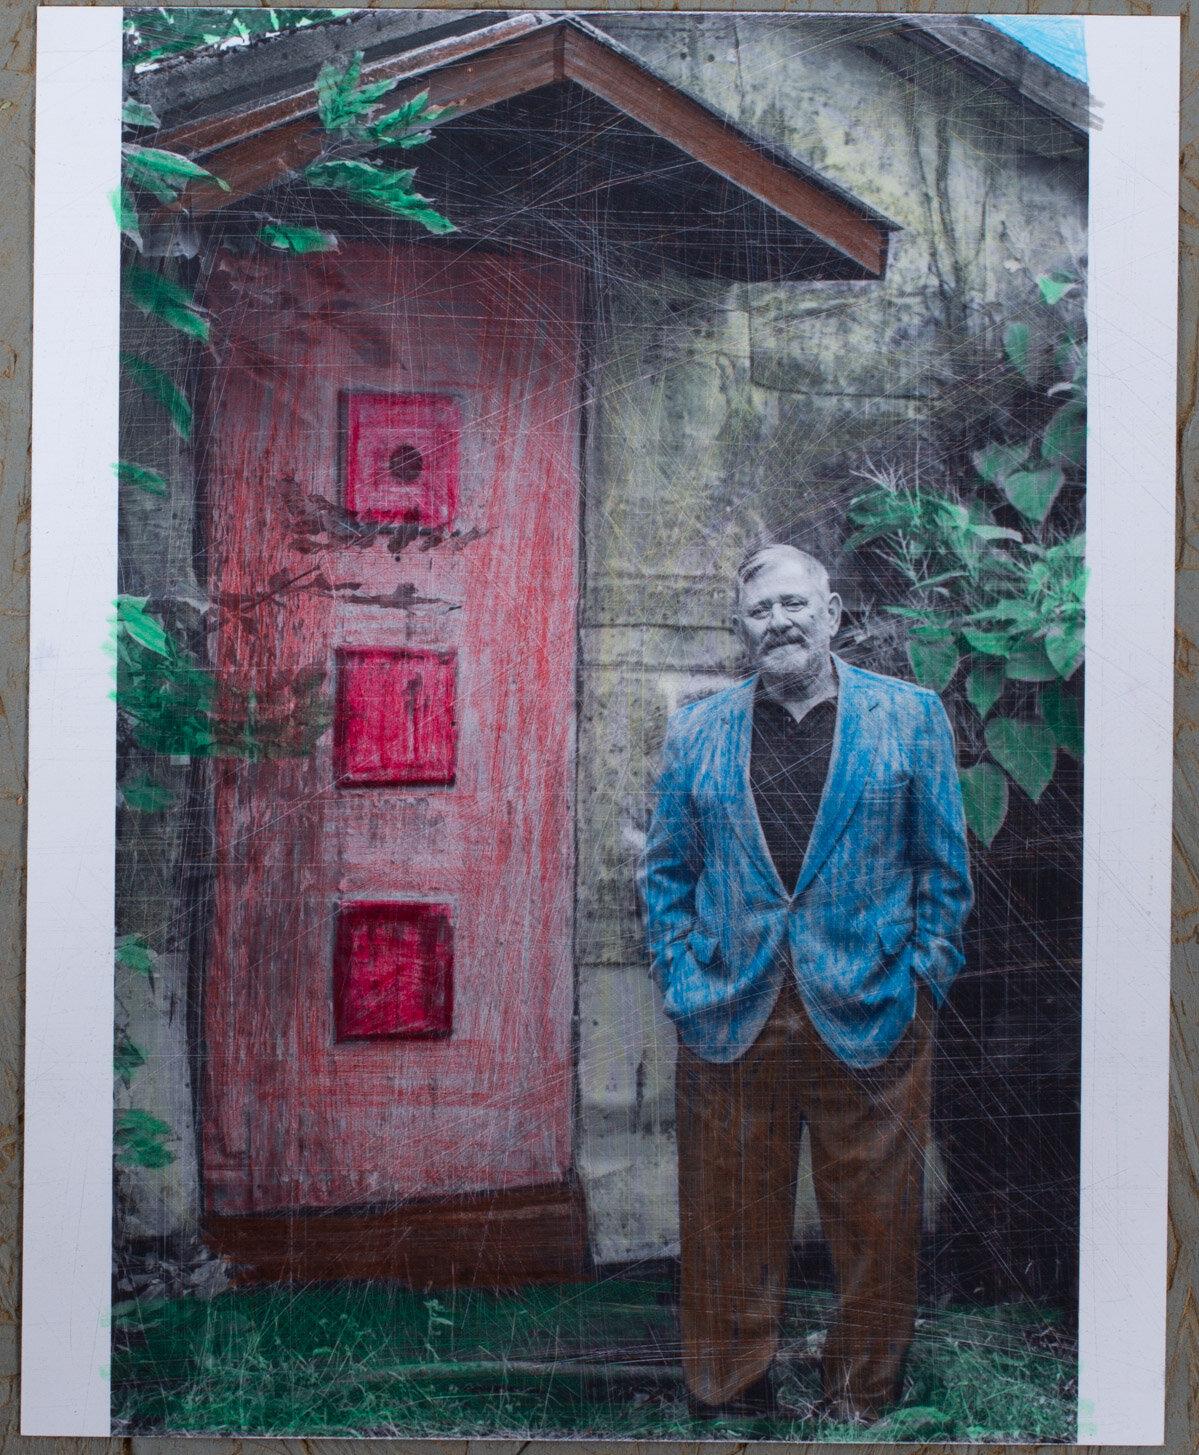 8x10 - photo print - pencil